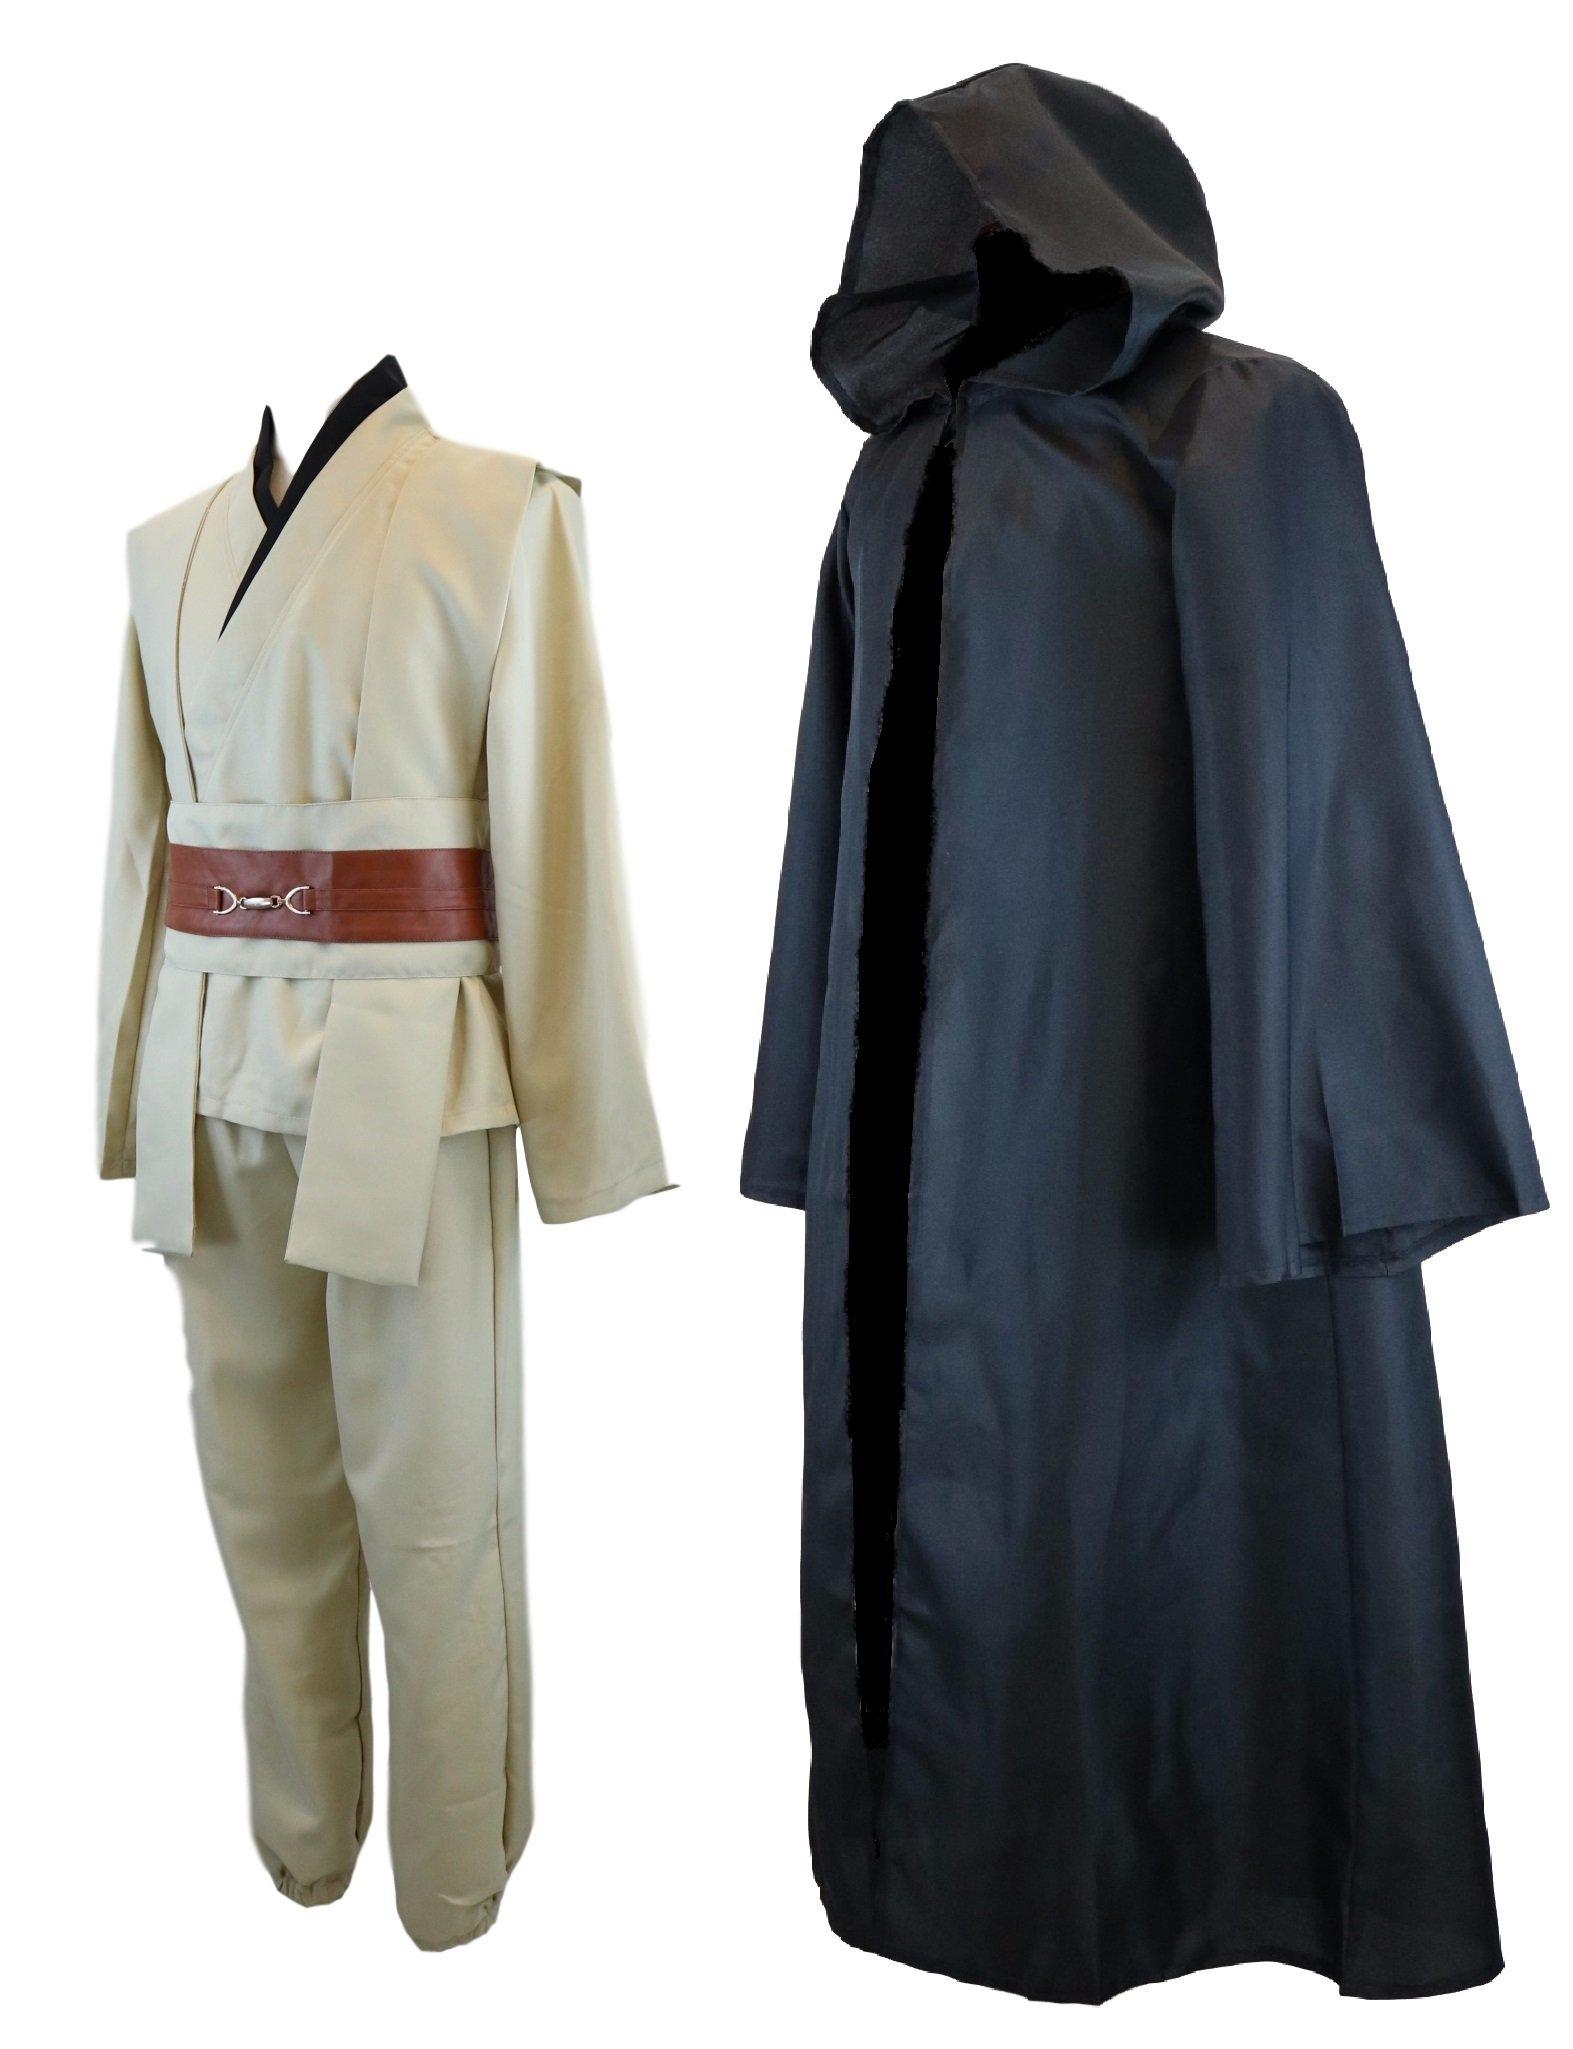 Hideaway Star Wars Jedi Style Robe Costume [ Black Version ] Anakin, OBI-Wan, Luke Cosplay Set (S) by Hide Away (Image #1)